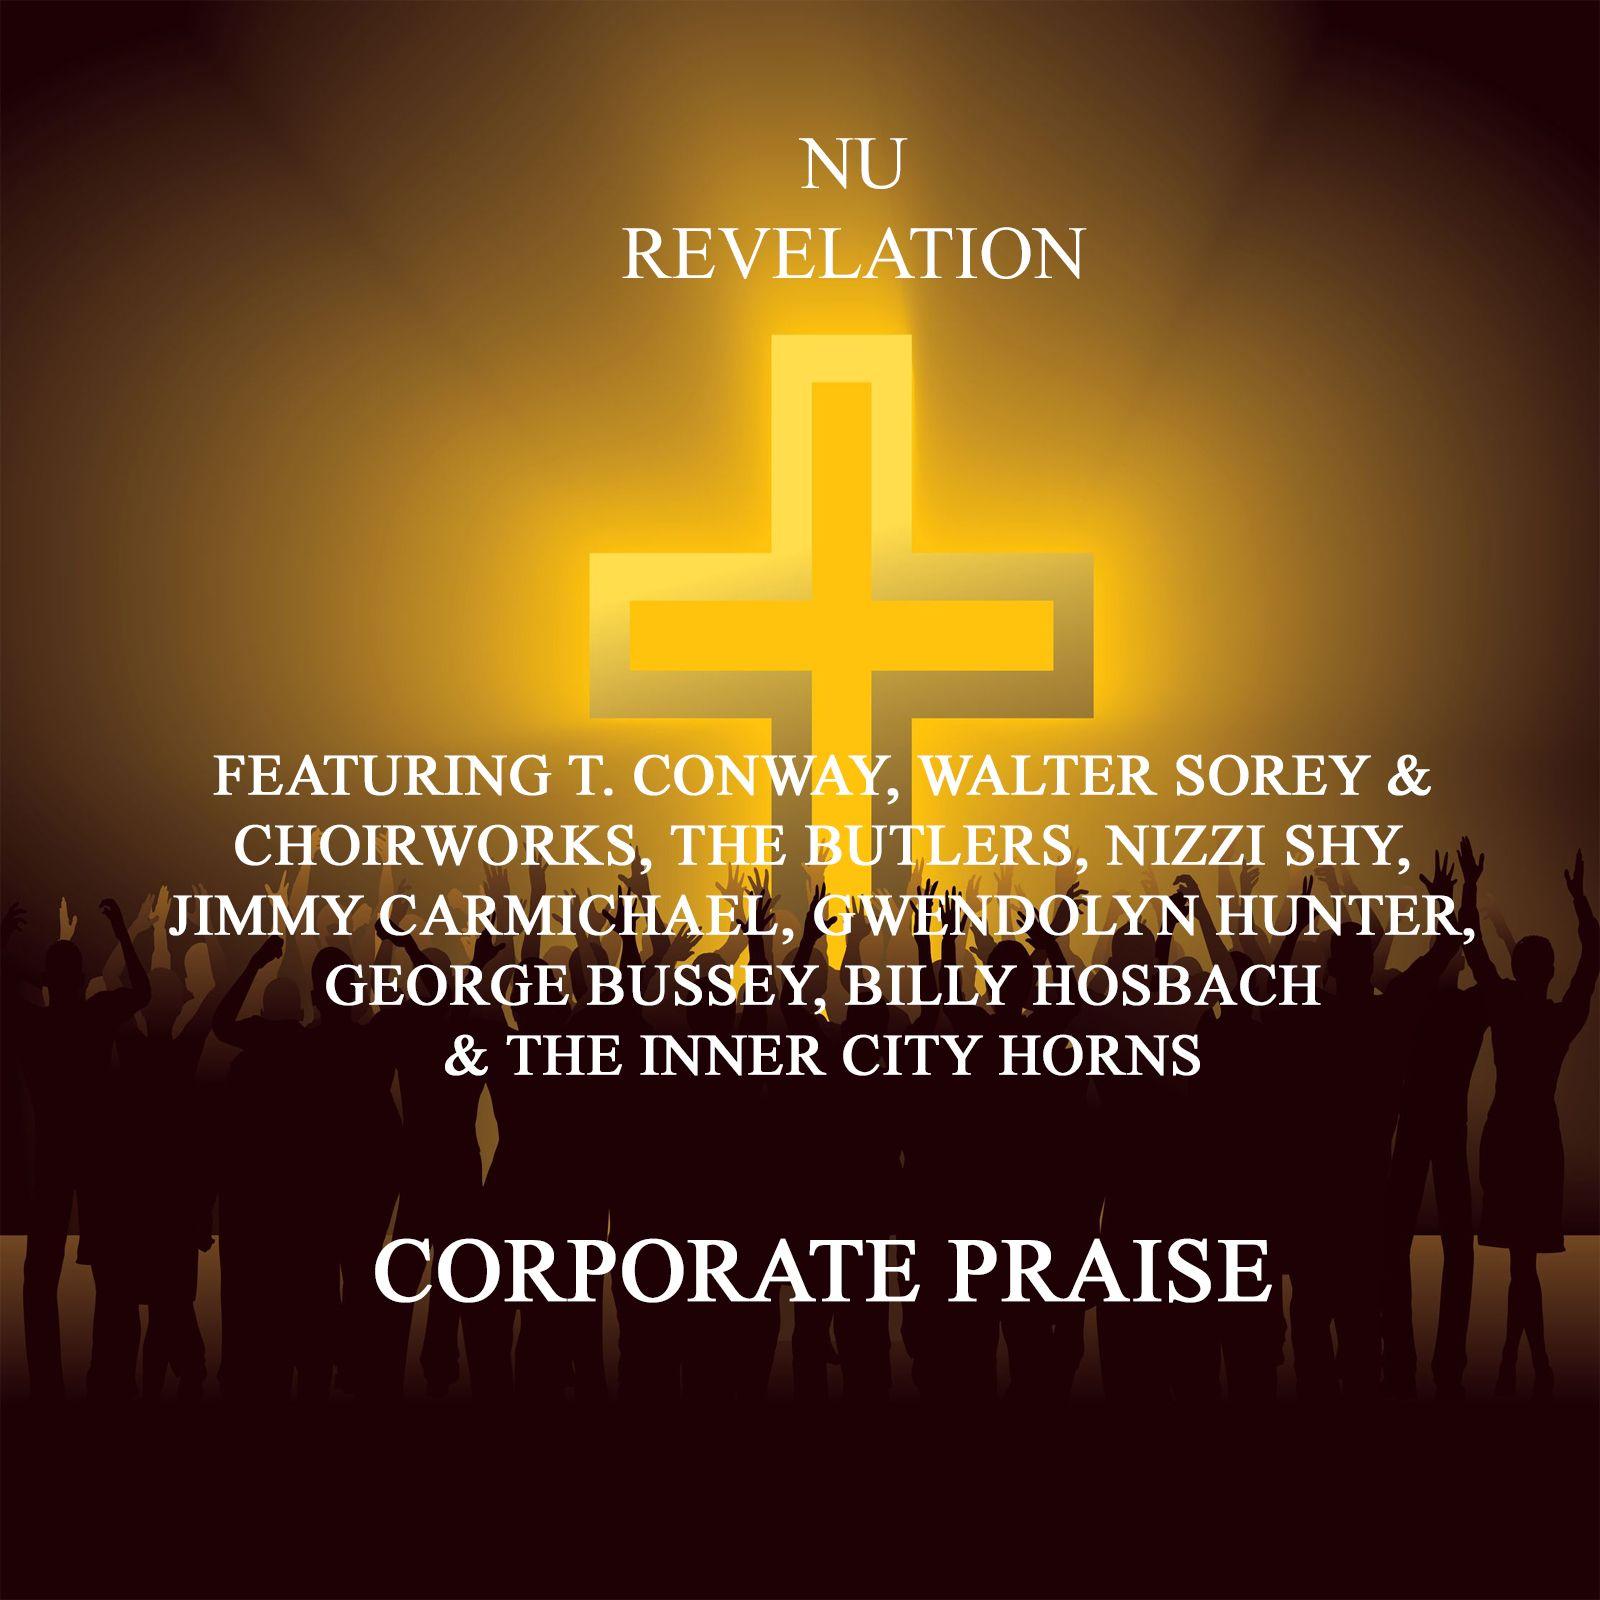 Nu Revelation